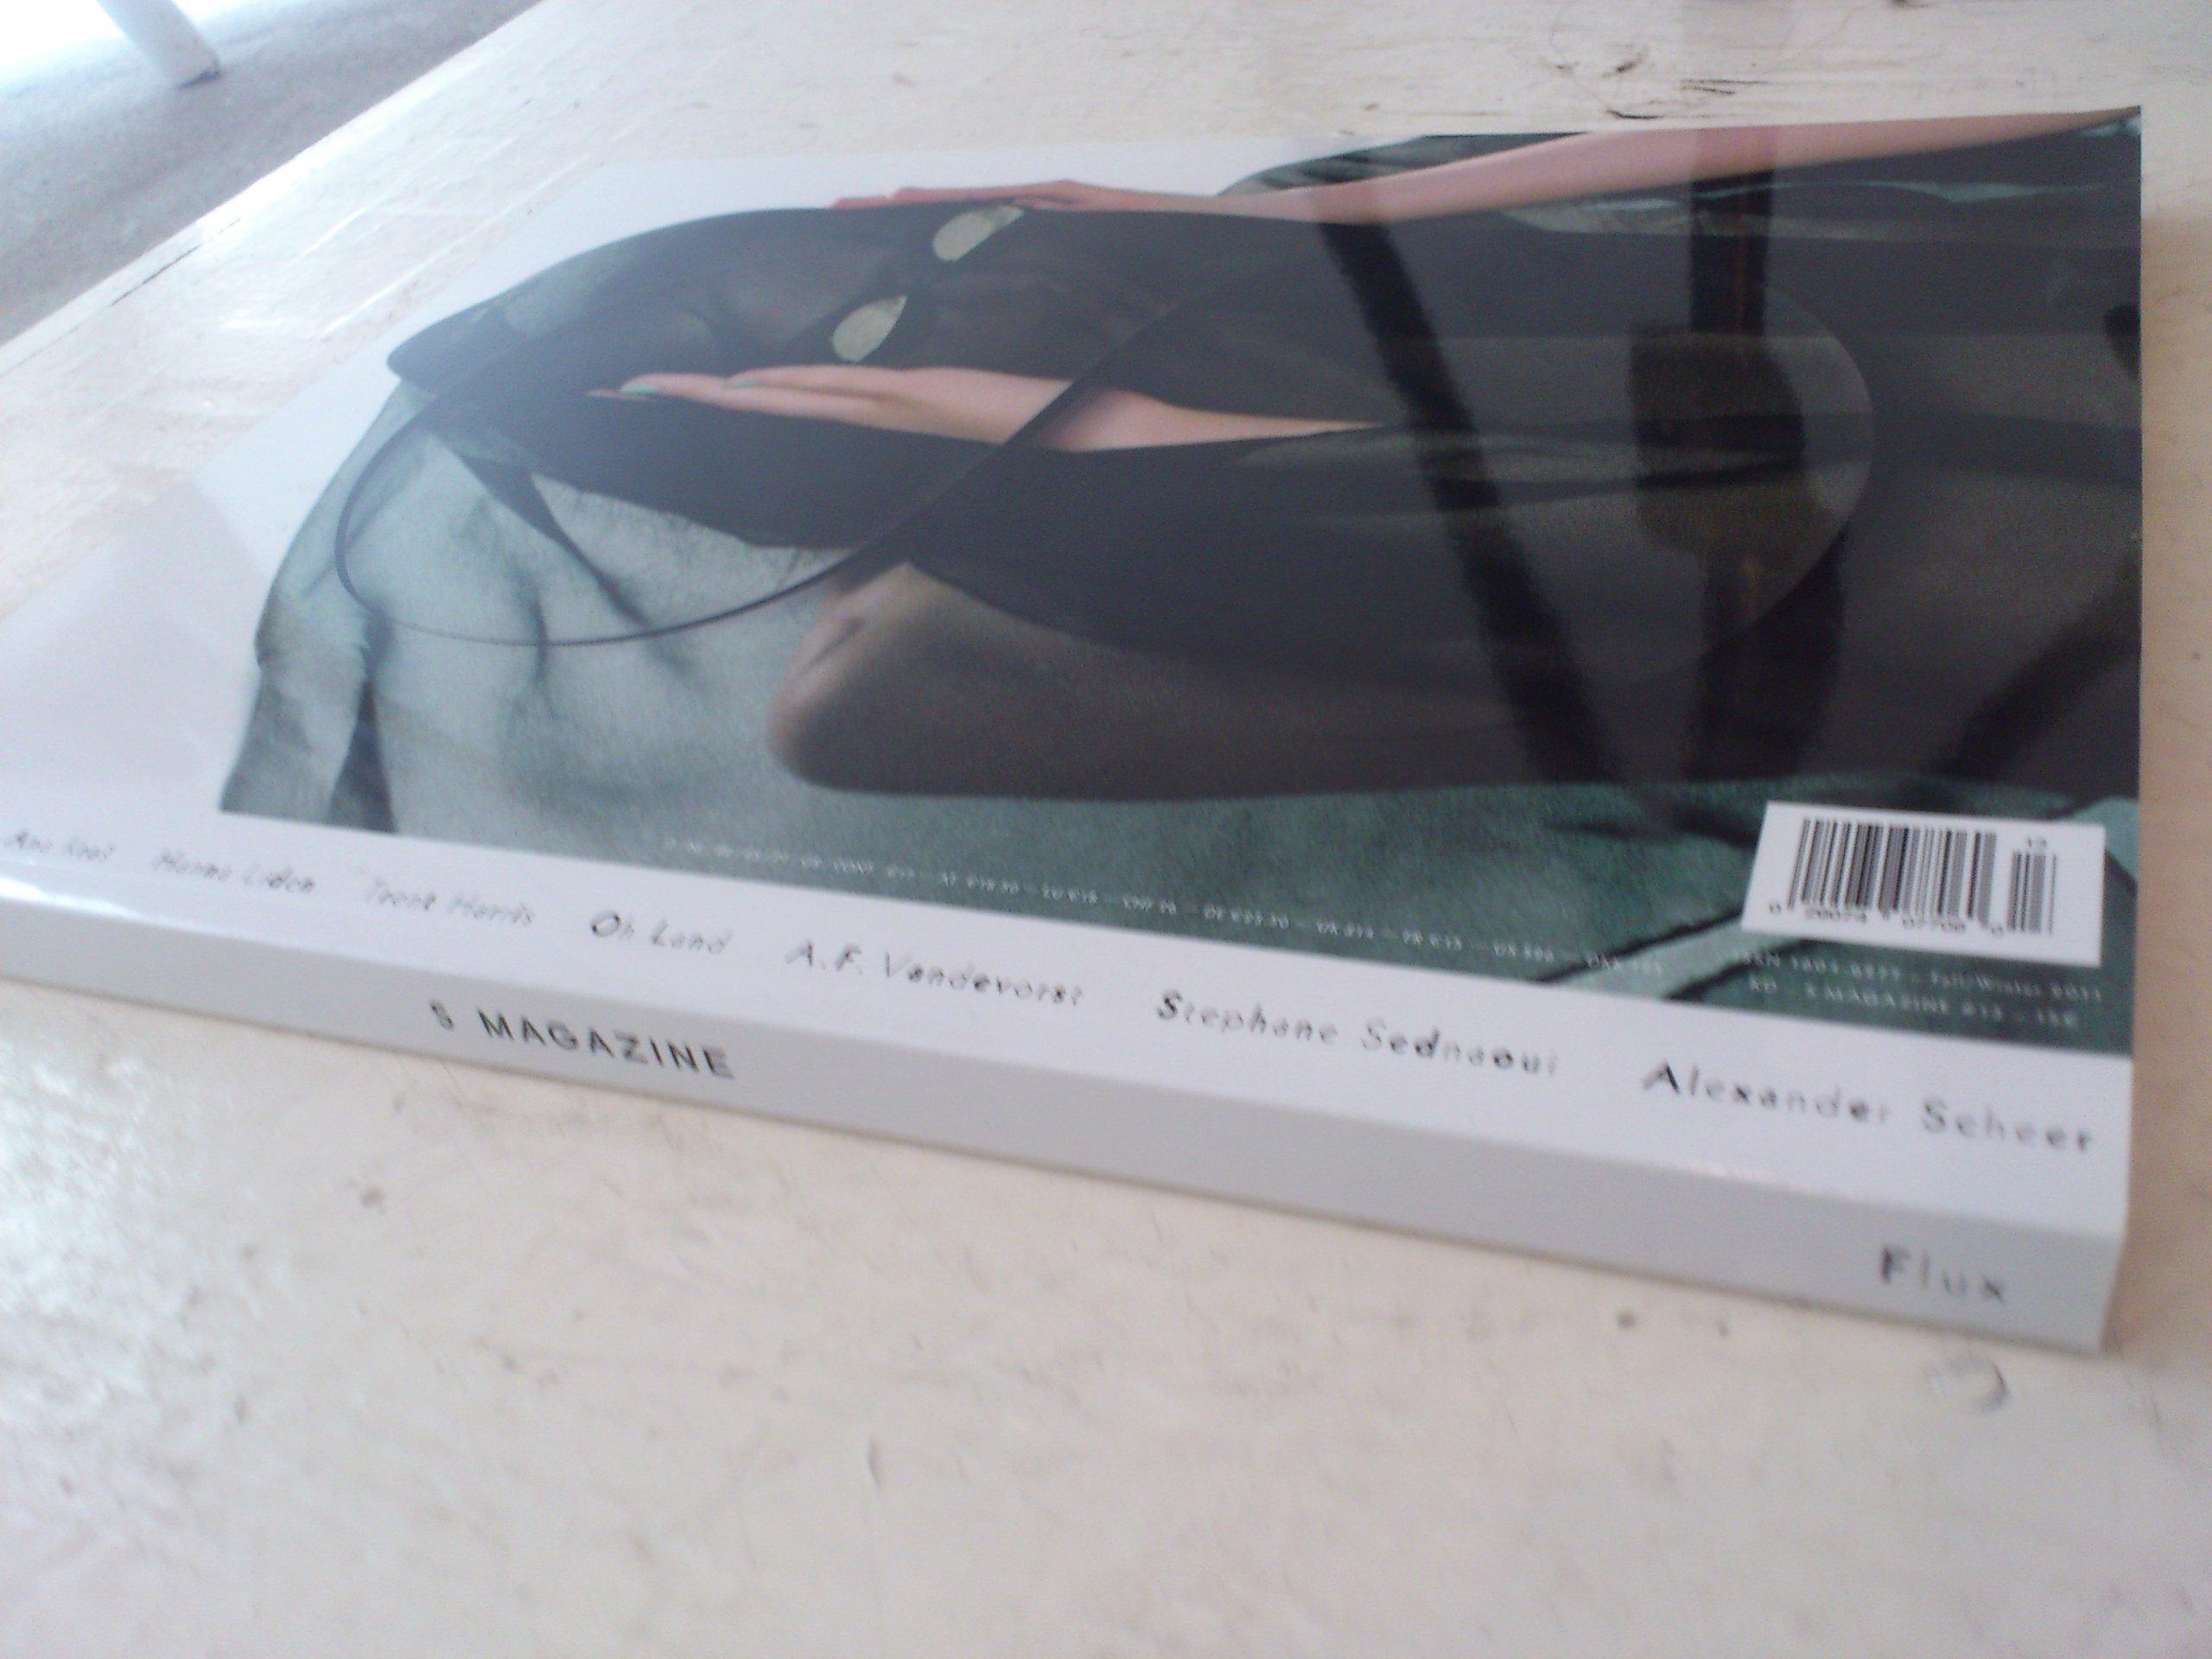 Aymeline valade valisere fw 2010 campaign hq photo shoot Erotic images Chelsea handler snapchat,Alyssa miller by adam franzino uhq photo shoot